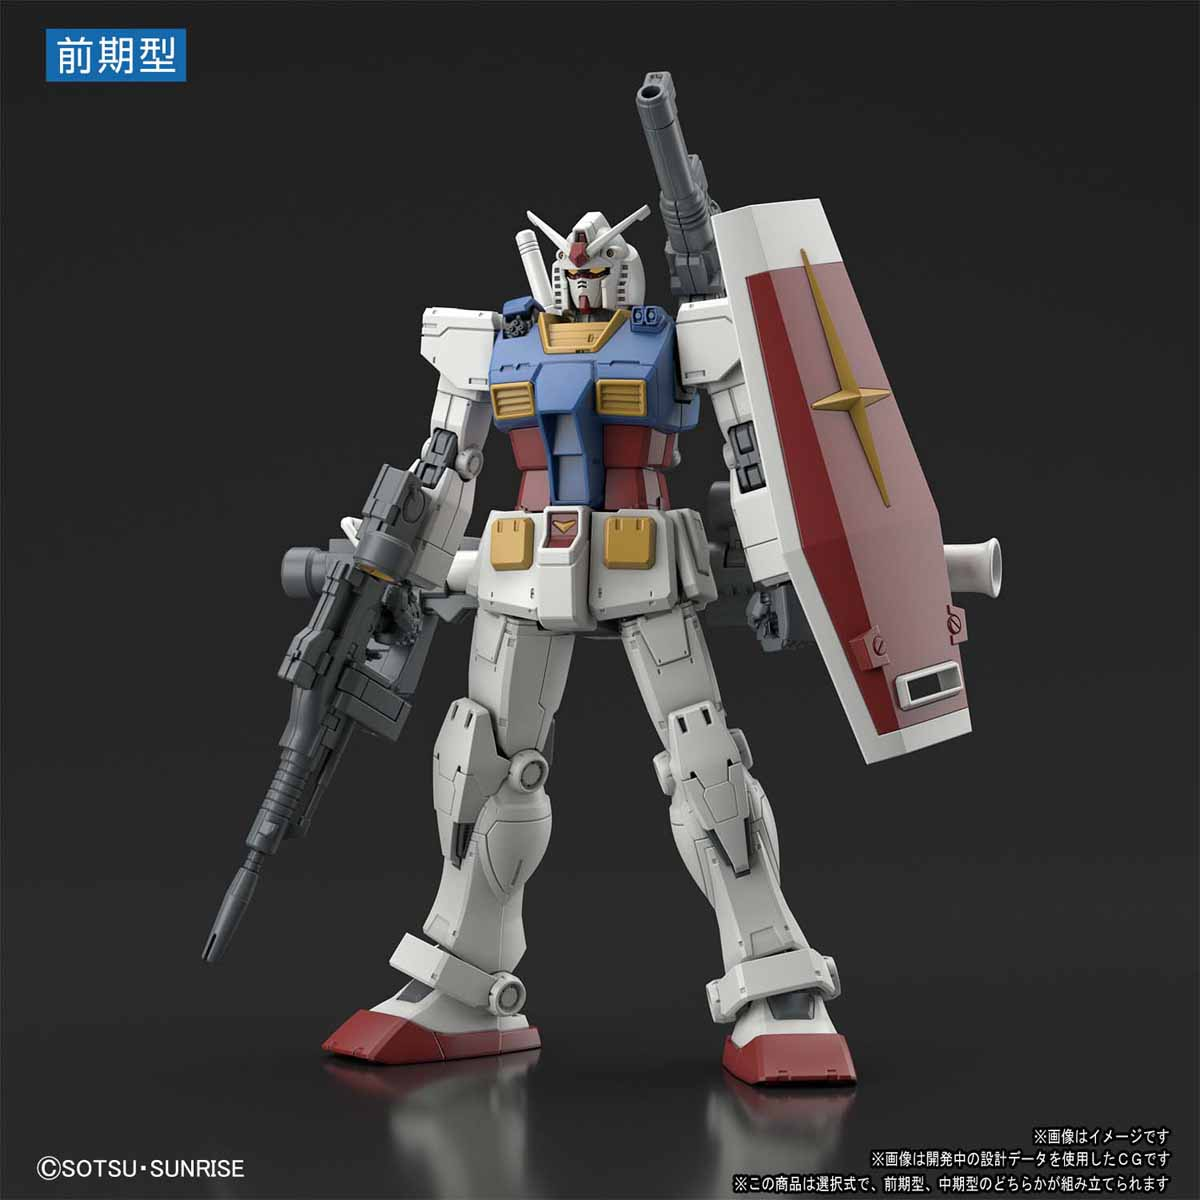 HG 1/144『RX-78-02 ガンダム(GUNDAM THE ORIGIN版)』プラモデル-002